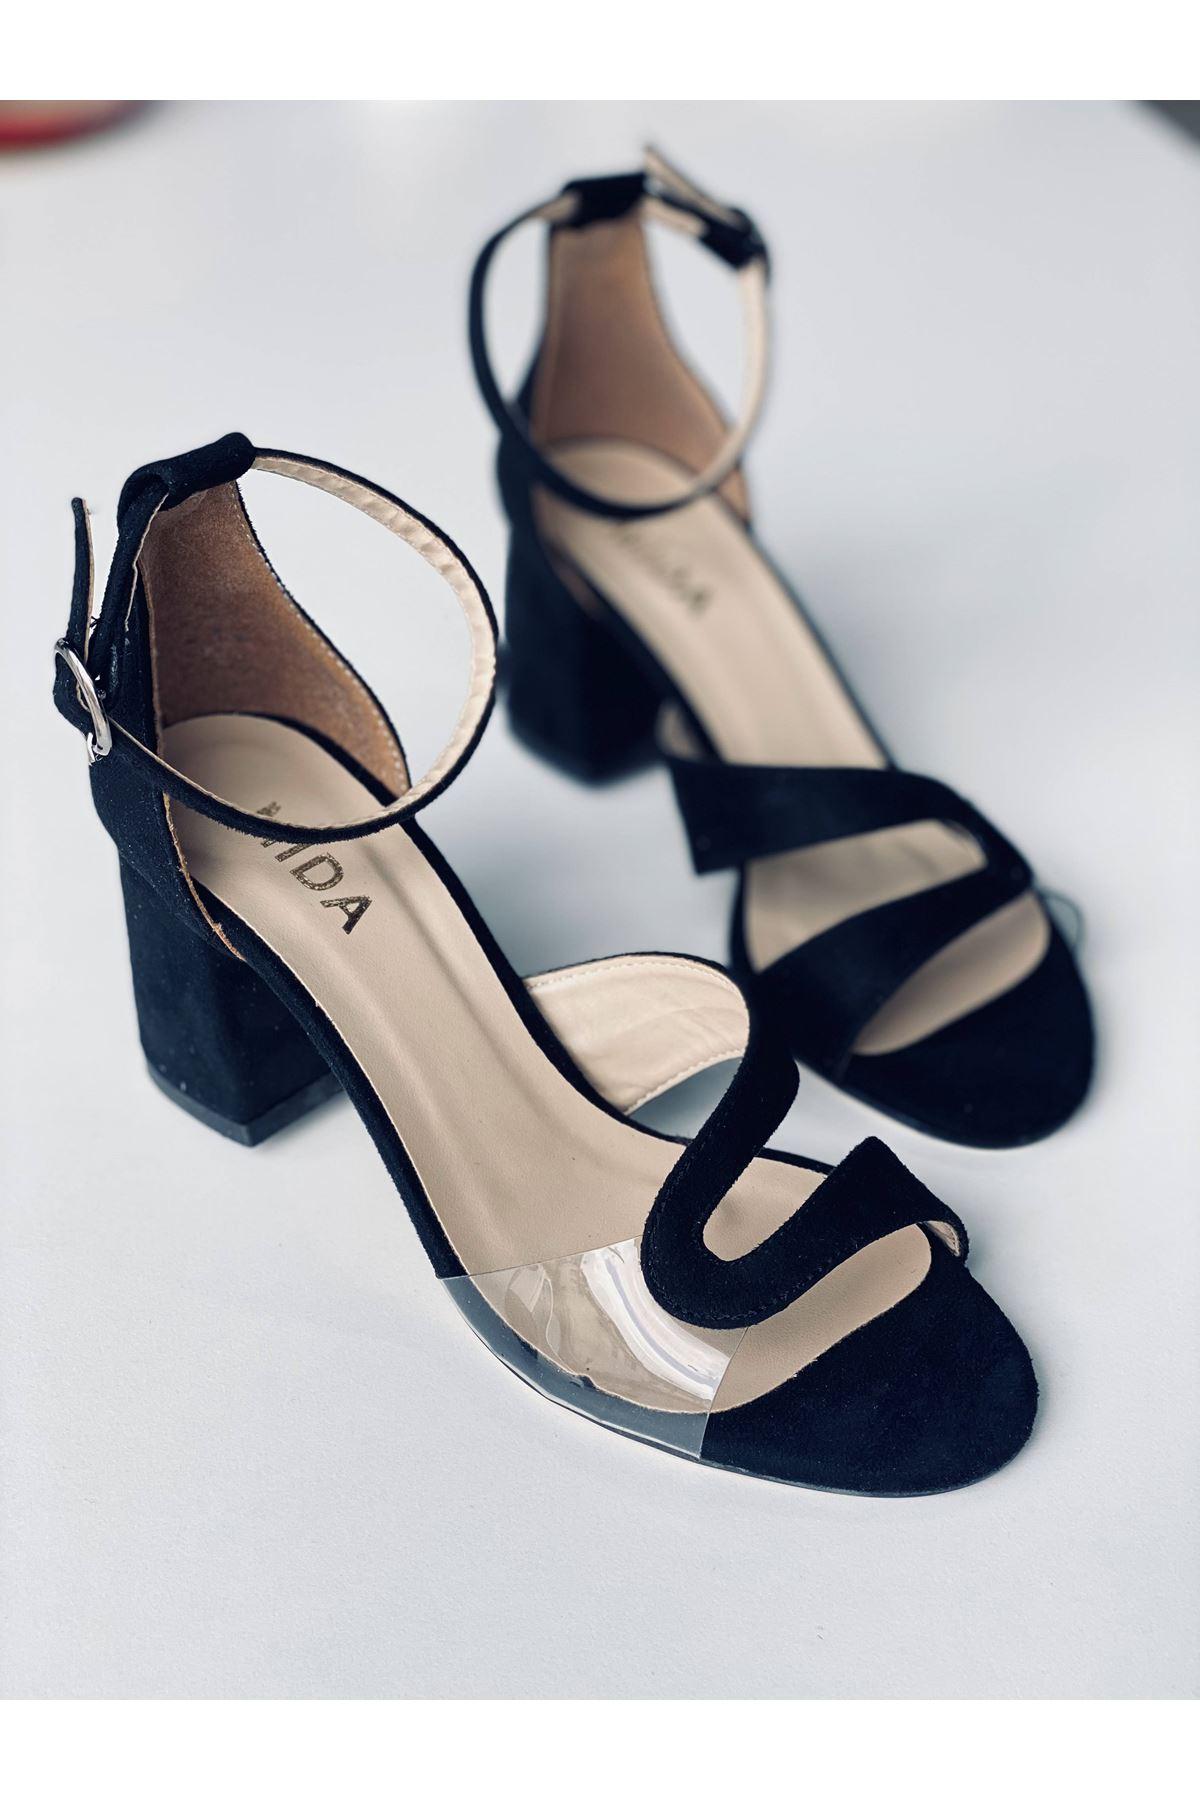 Y610 Siyah Suet Topuklu Ayakkabı